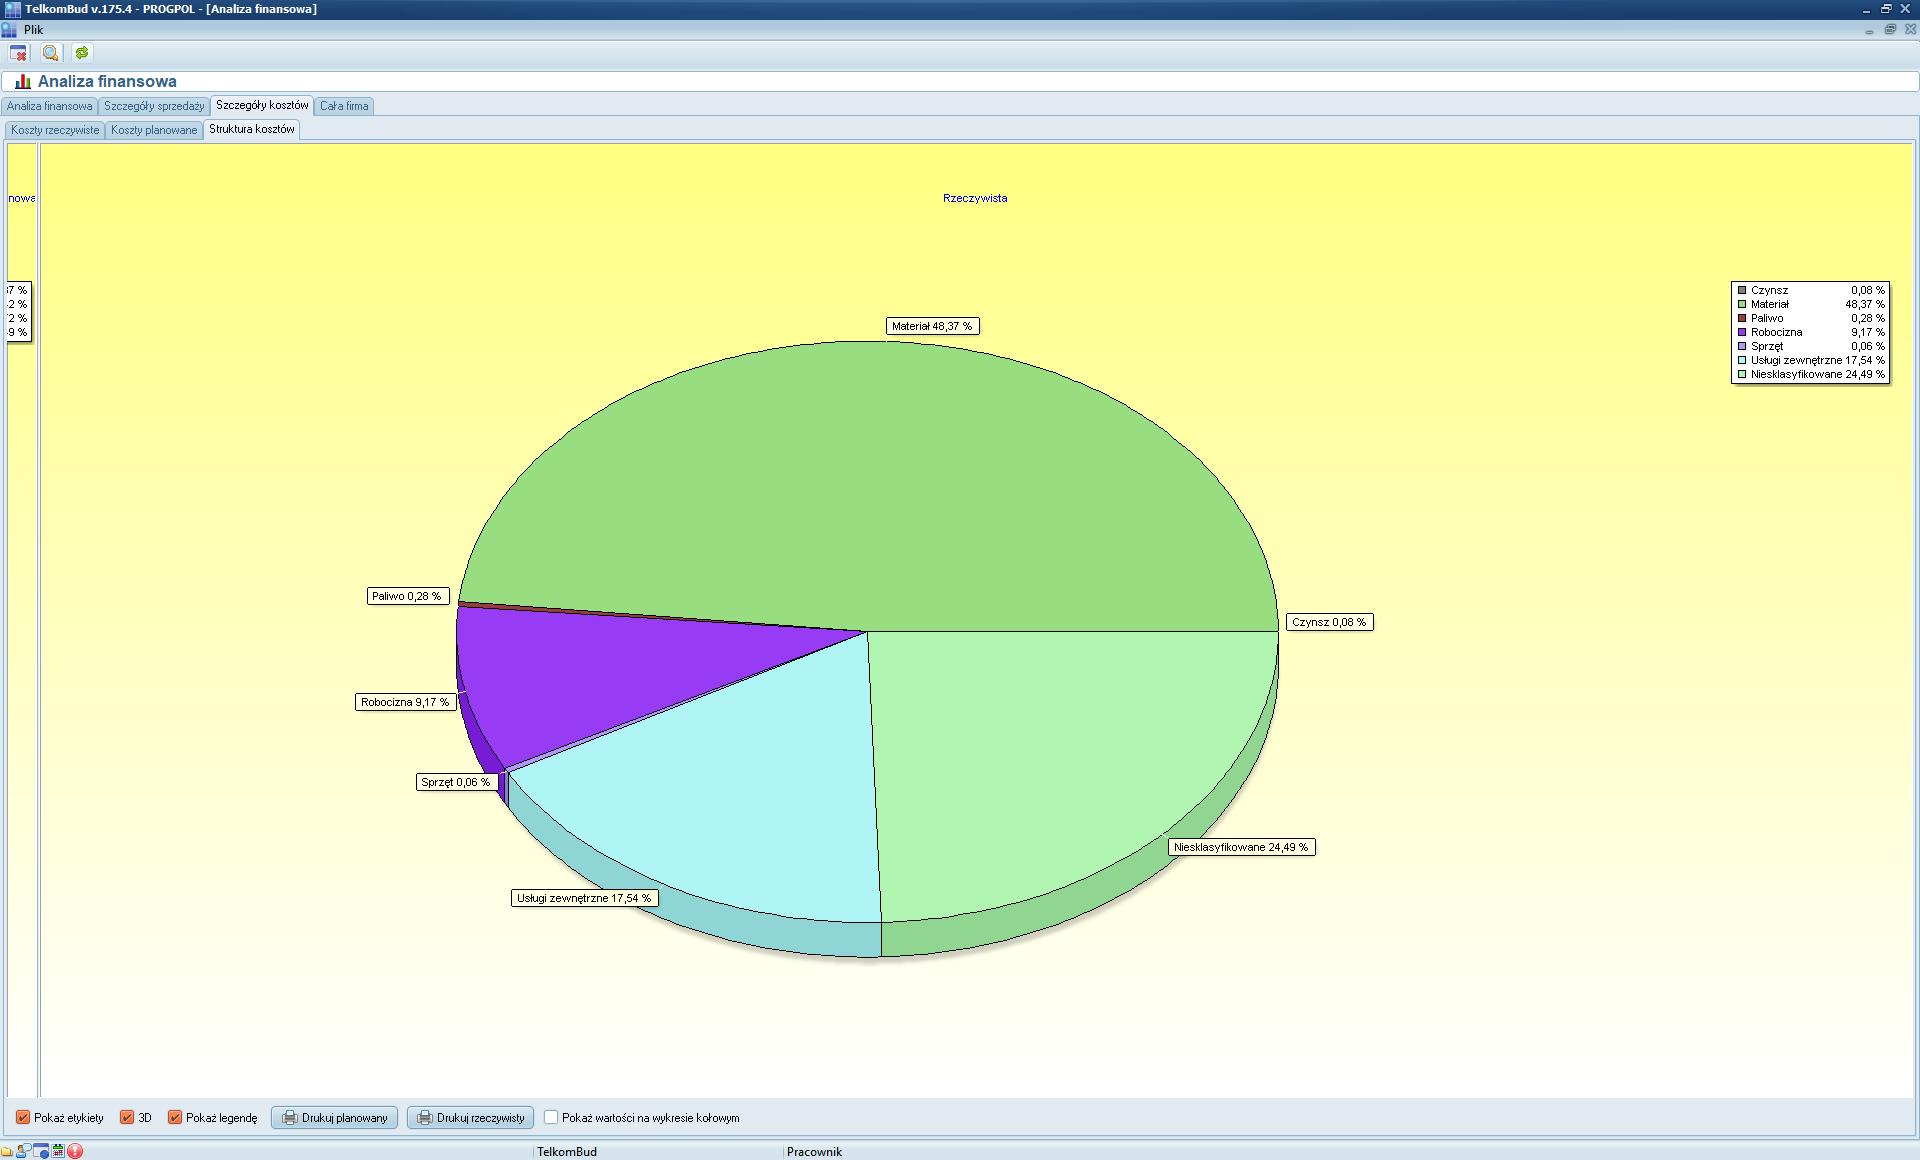 Raport analiza finansowa modułu Finanse w systemie TelkomBud